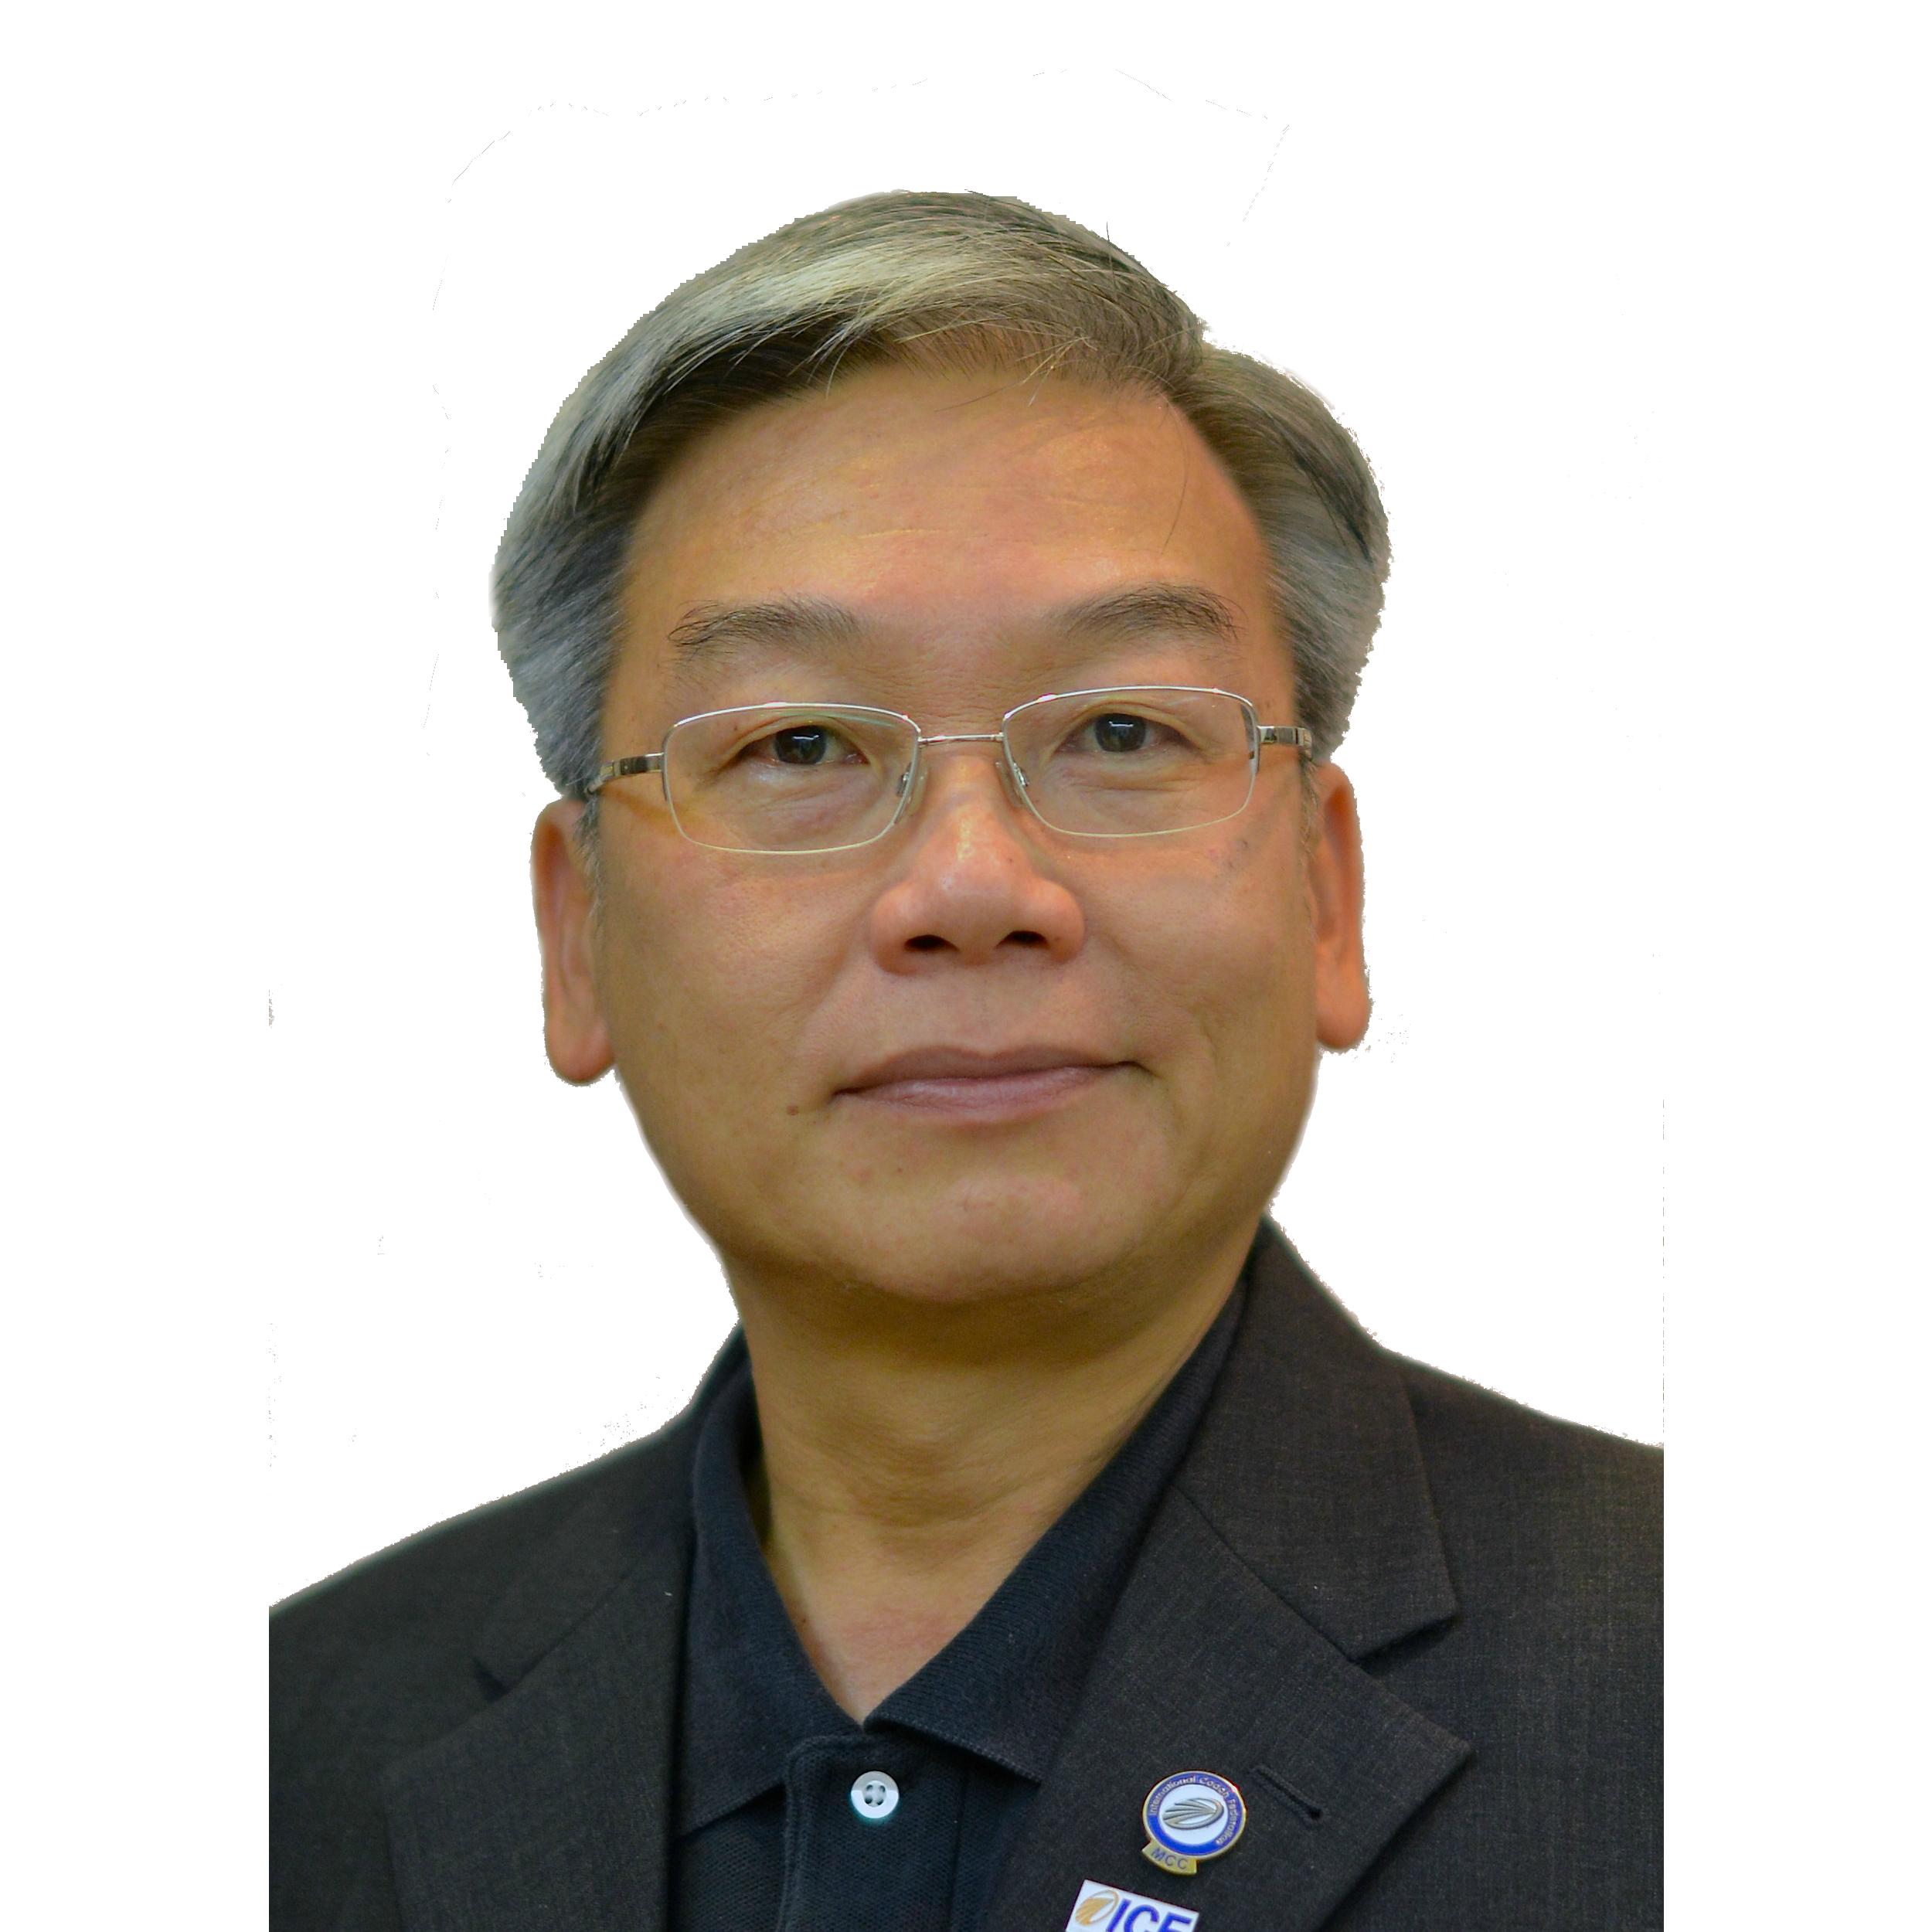 Wai K. Leong